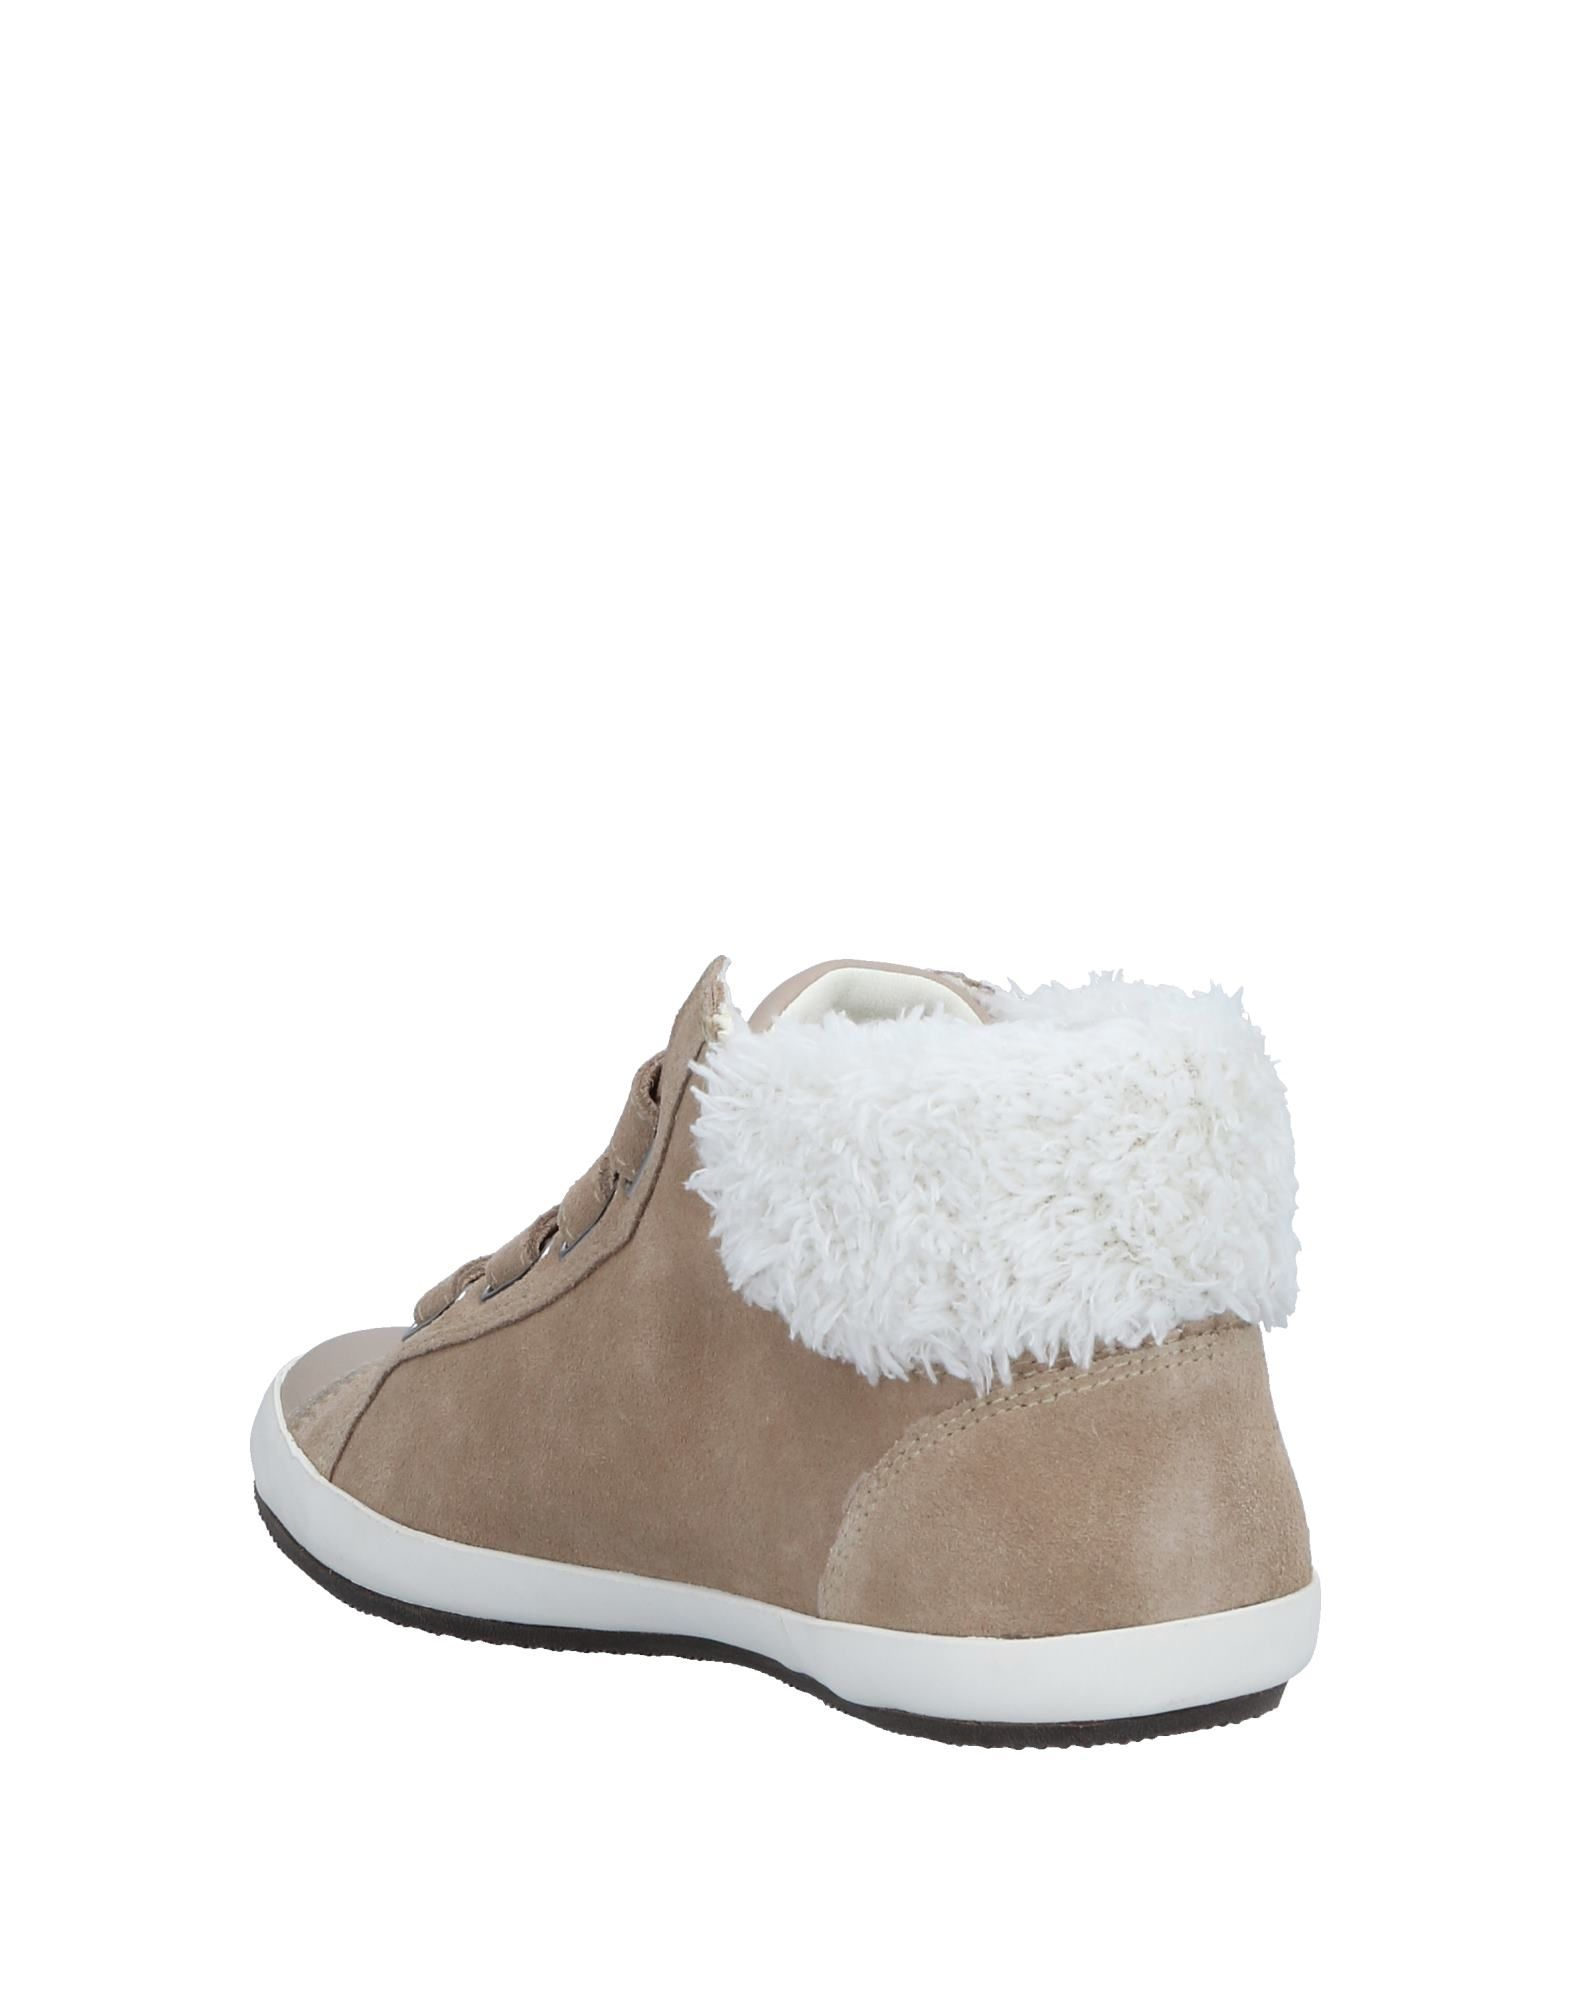 Gut Jeans um billige Schuhe zu tragenArmani Jeans Gut Sneakers Damen  11521157JL ec48ea